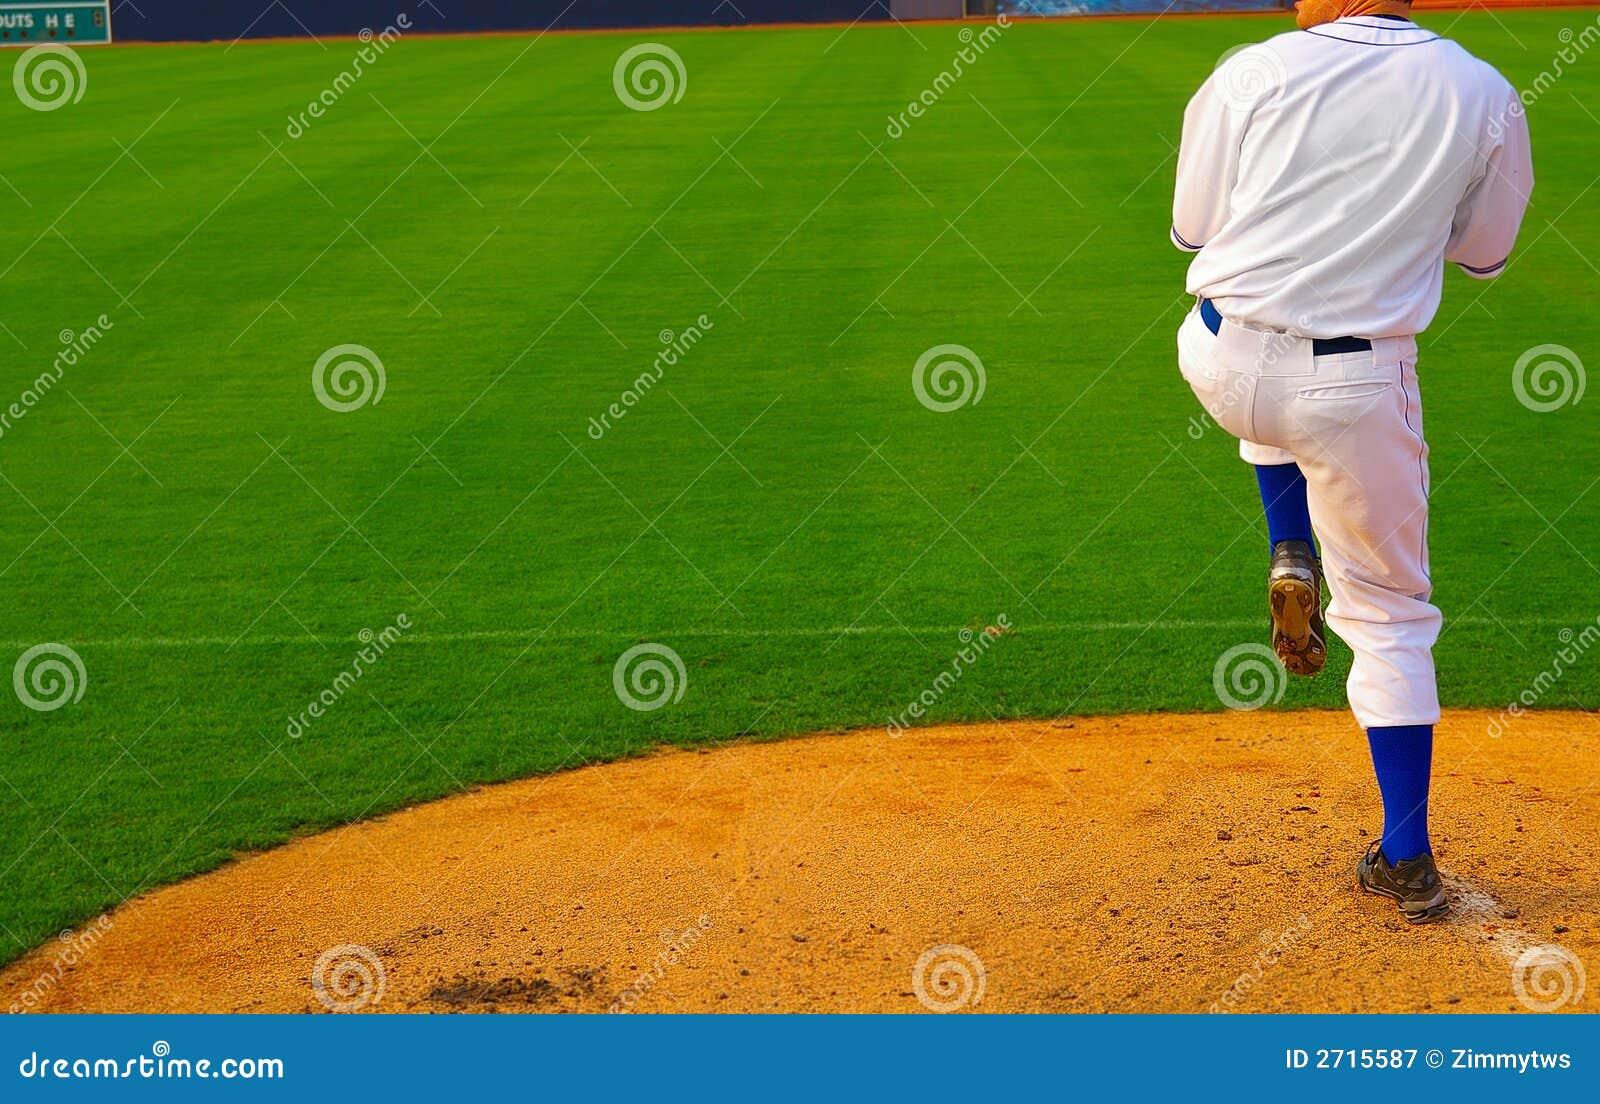 Brocca di baseball